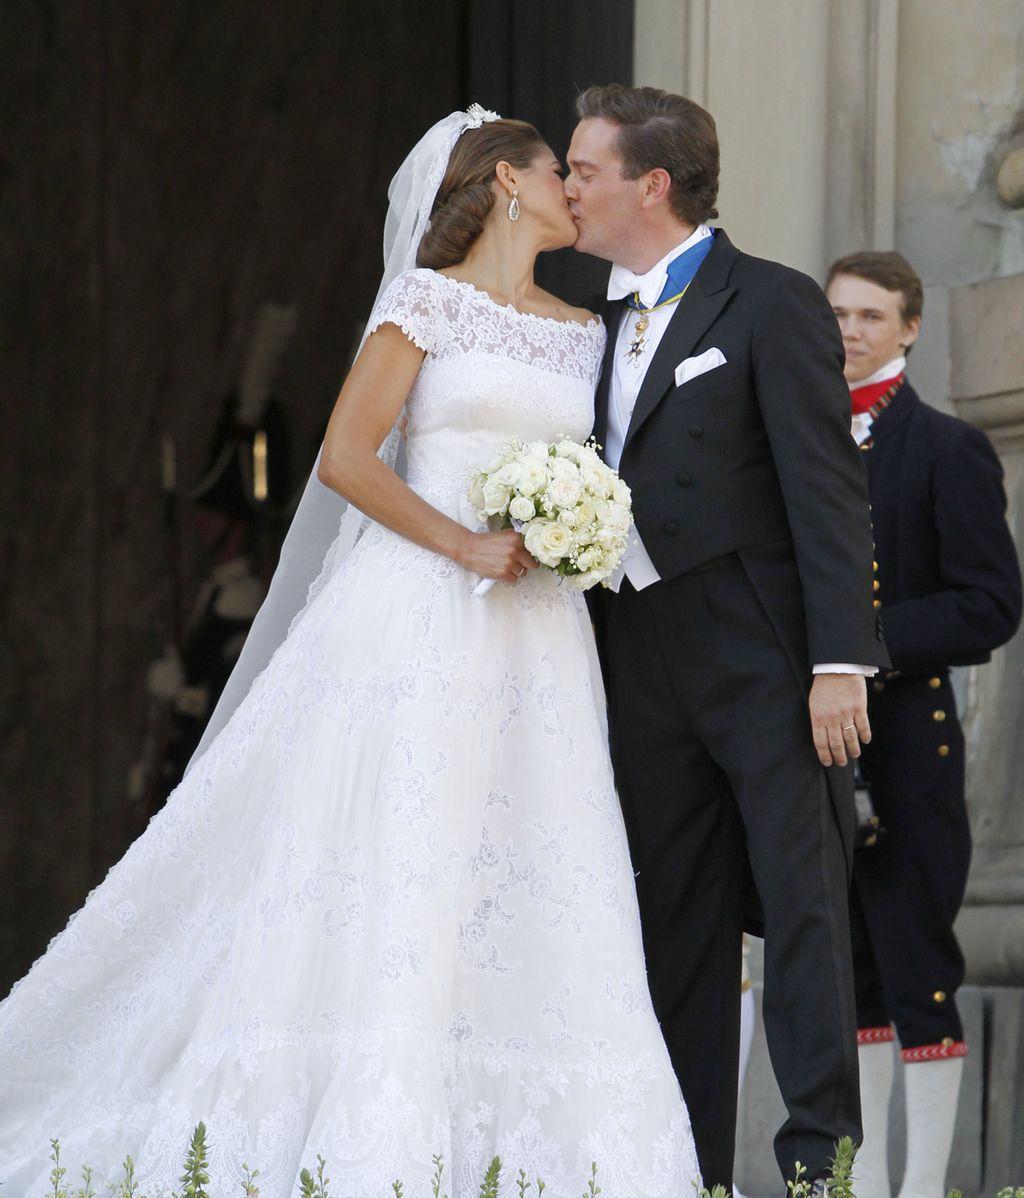 Blanca y radiante va la novia